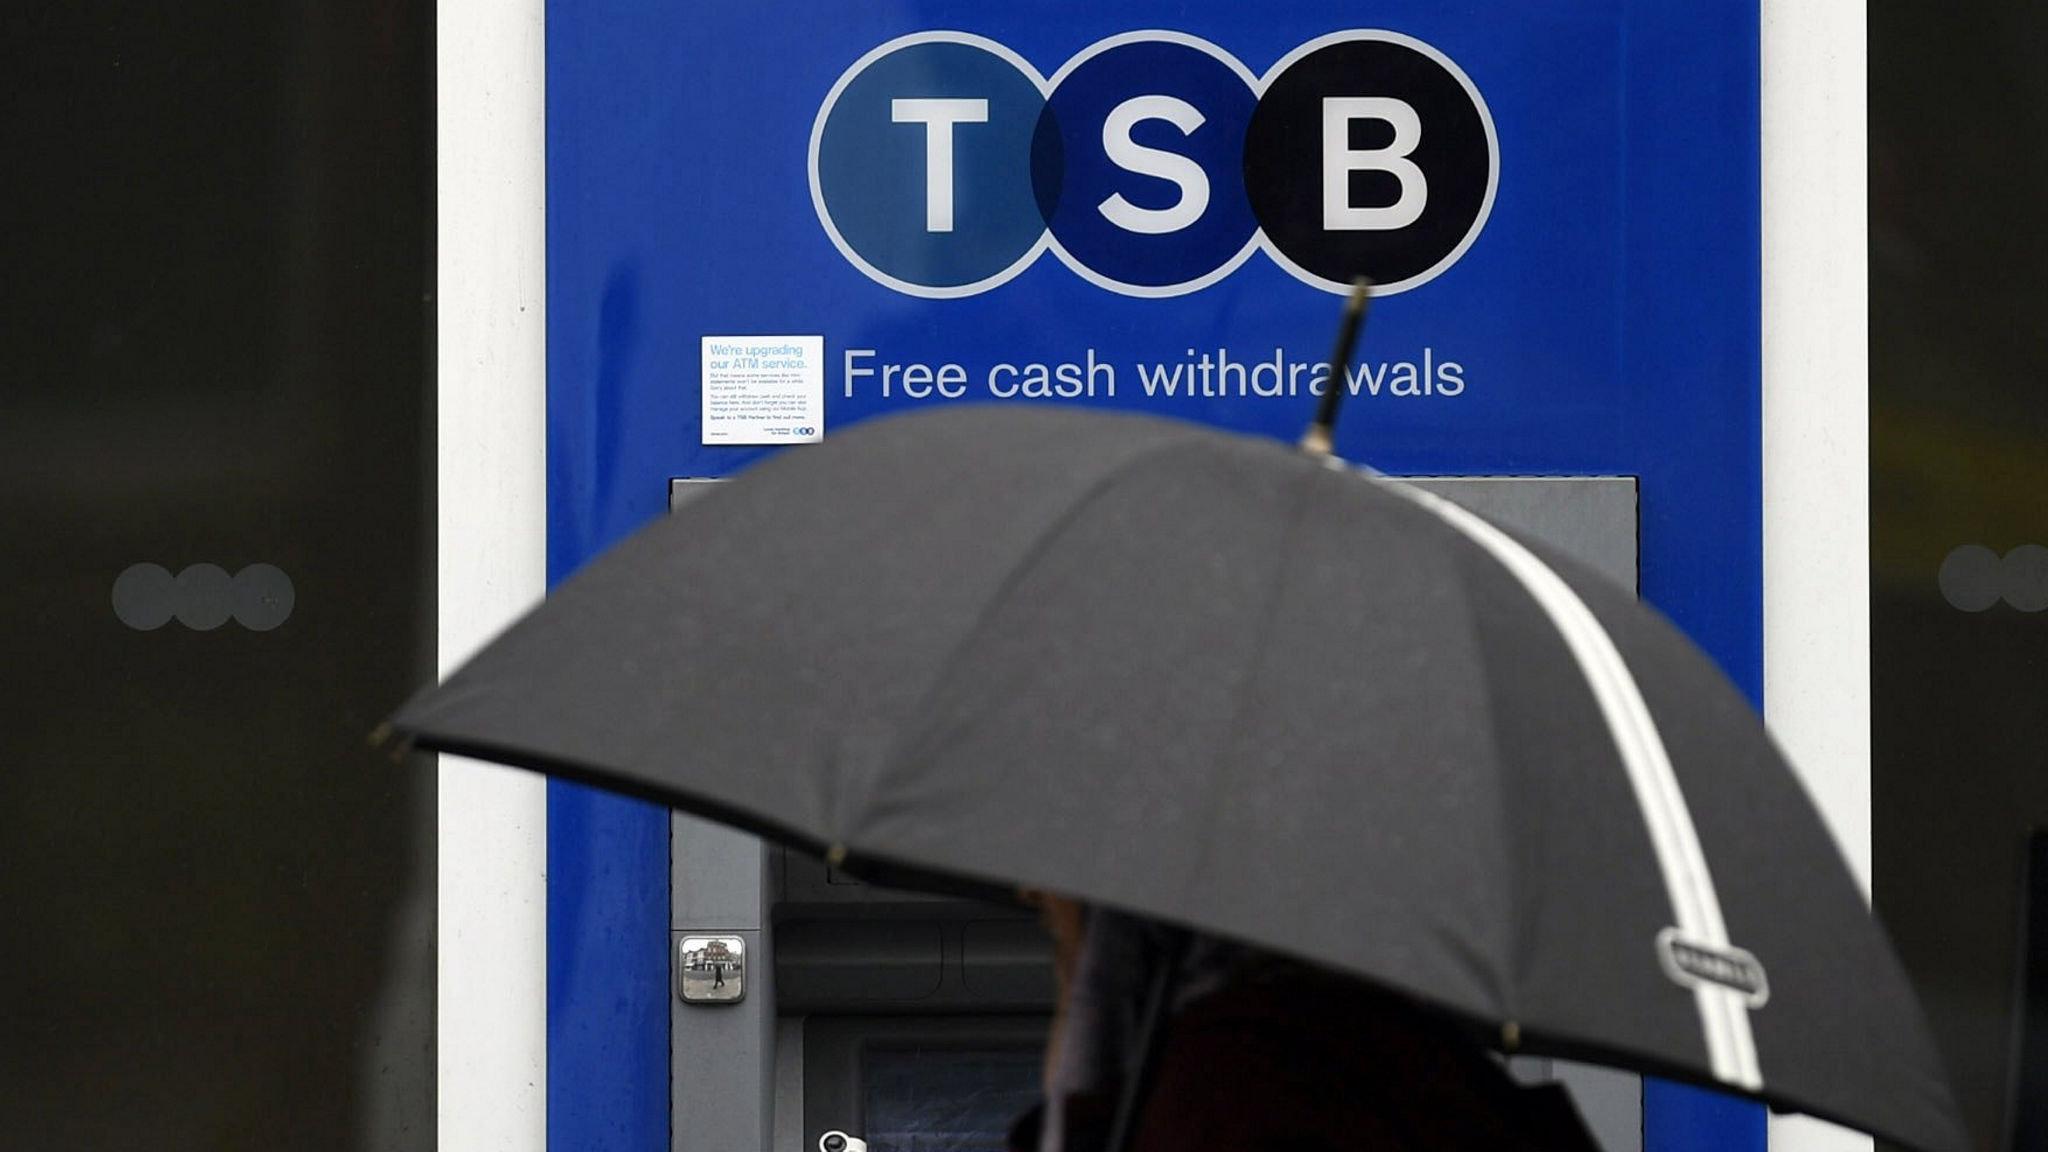 TSB lacked 'common sense' before IT glitch, says report